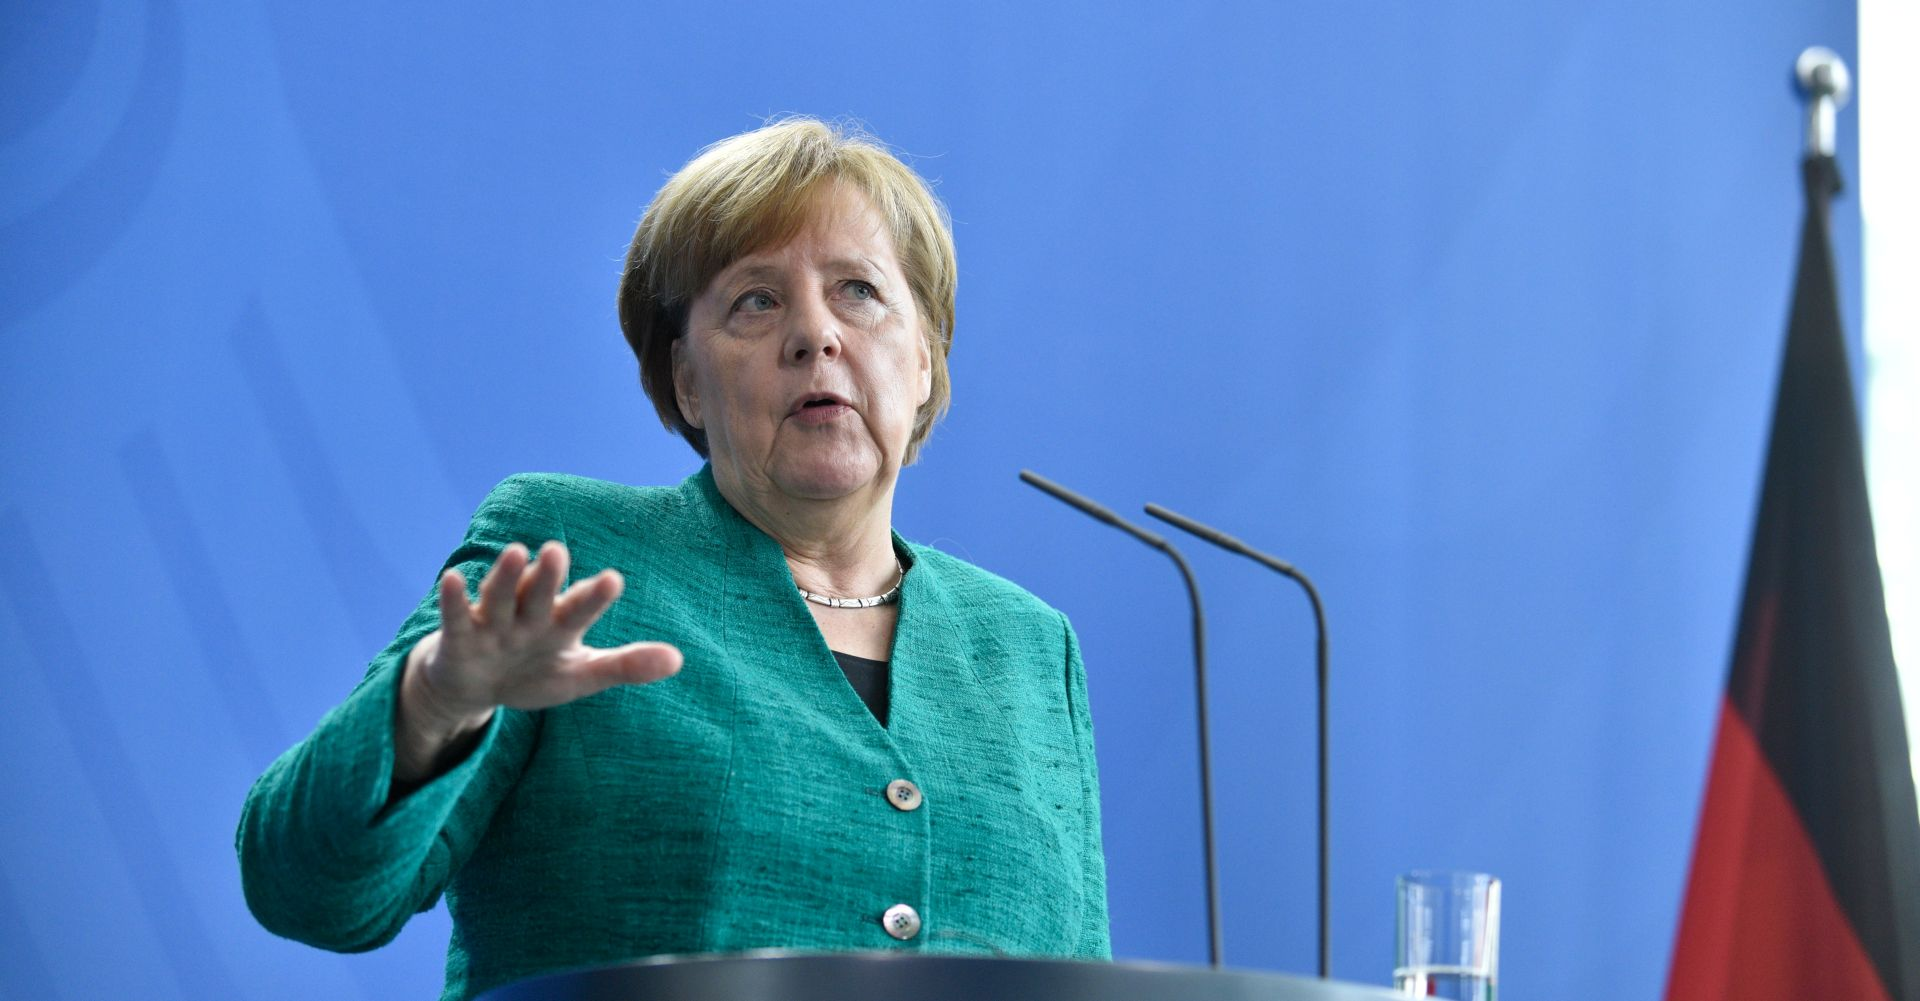 Kritike na račun Merkel zbog migracijske politike